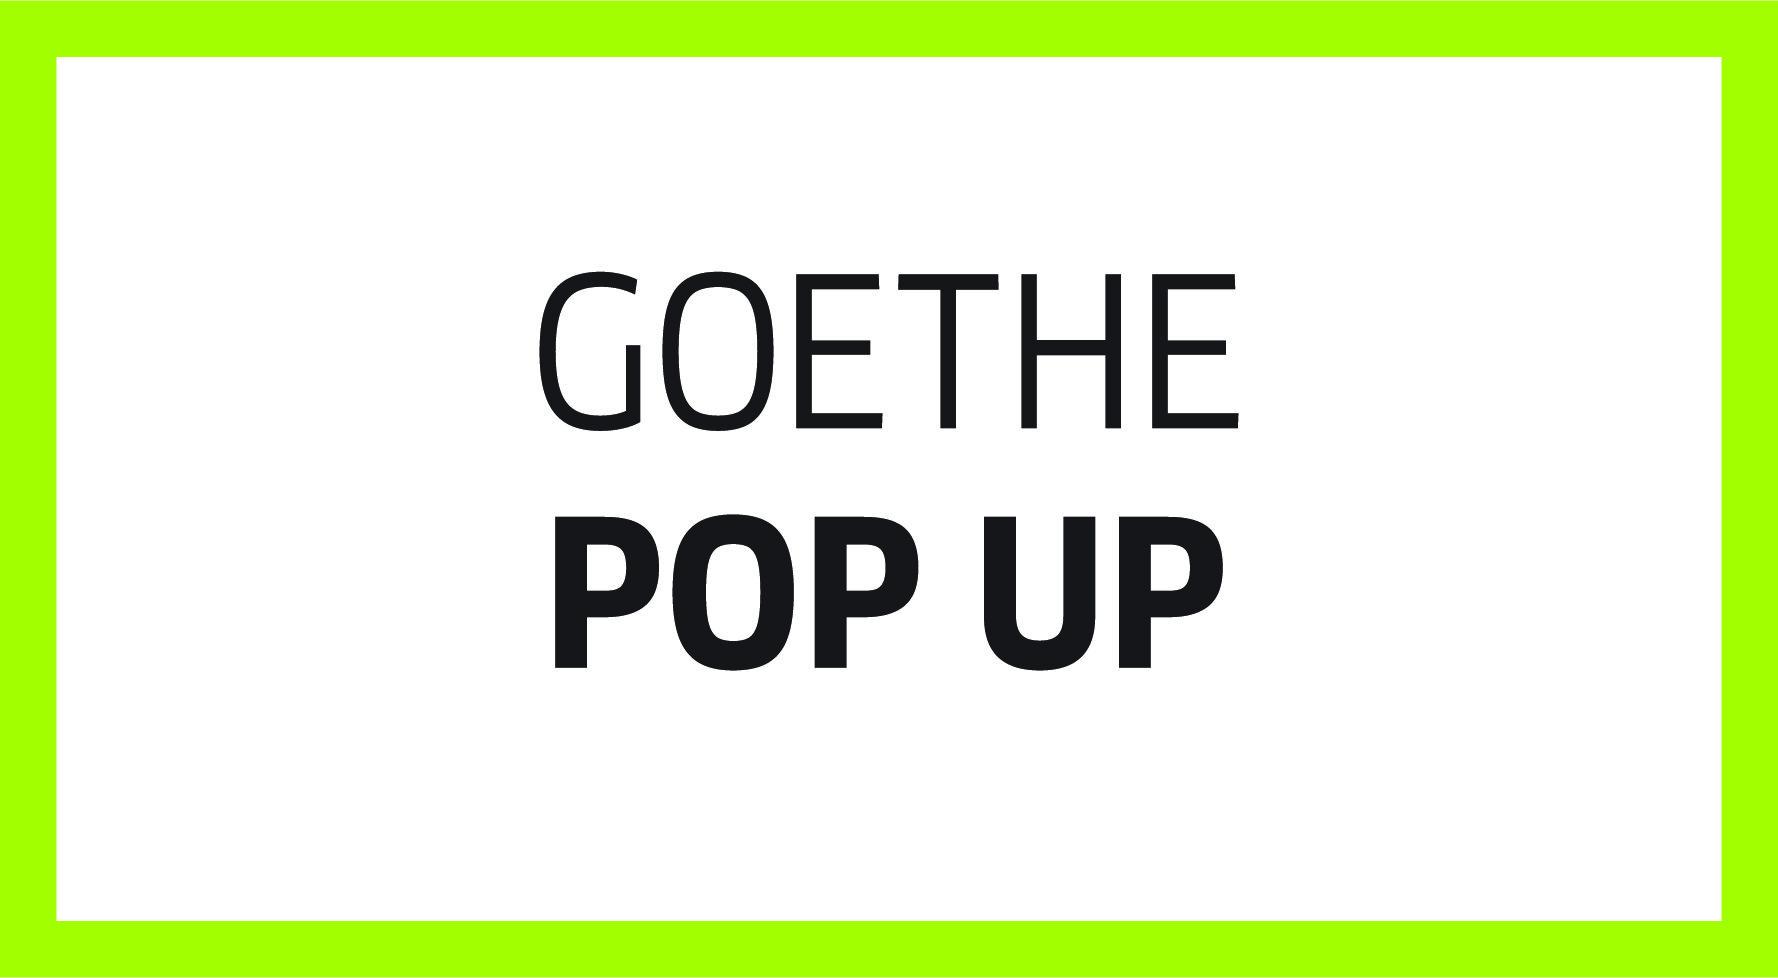 Goethe-Pop-Up-Logo-CMYKuncoated-black_type.jpg